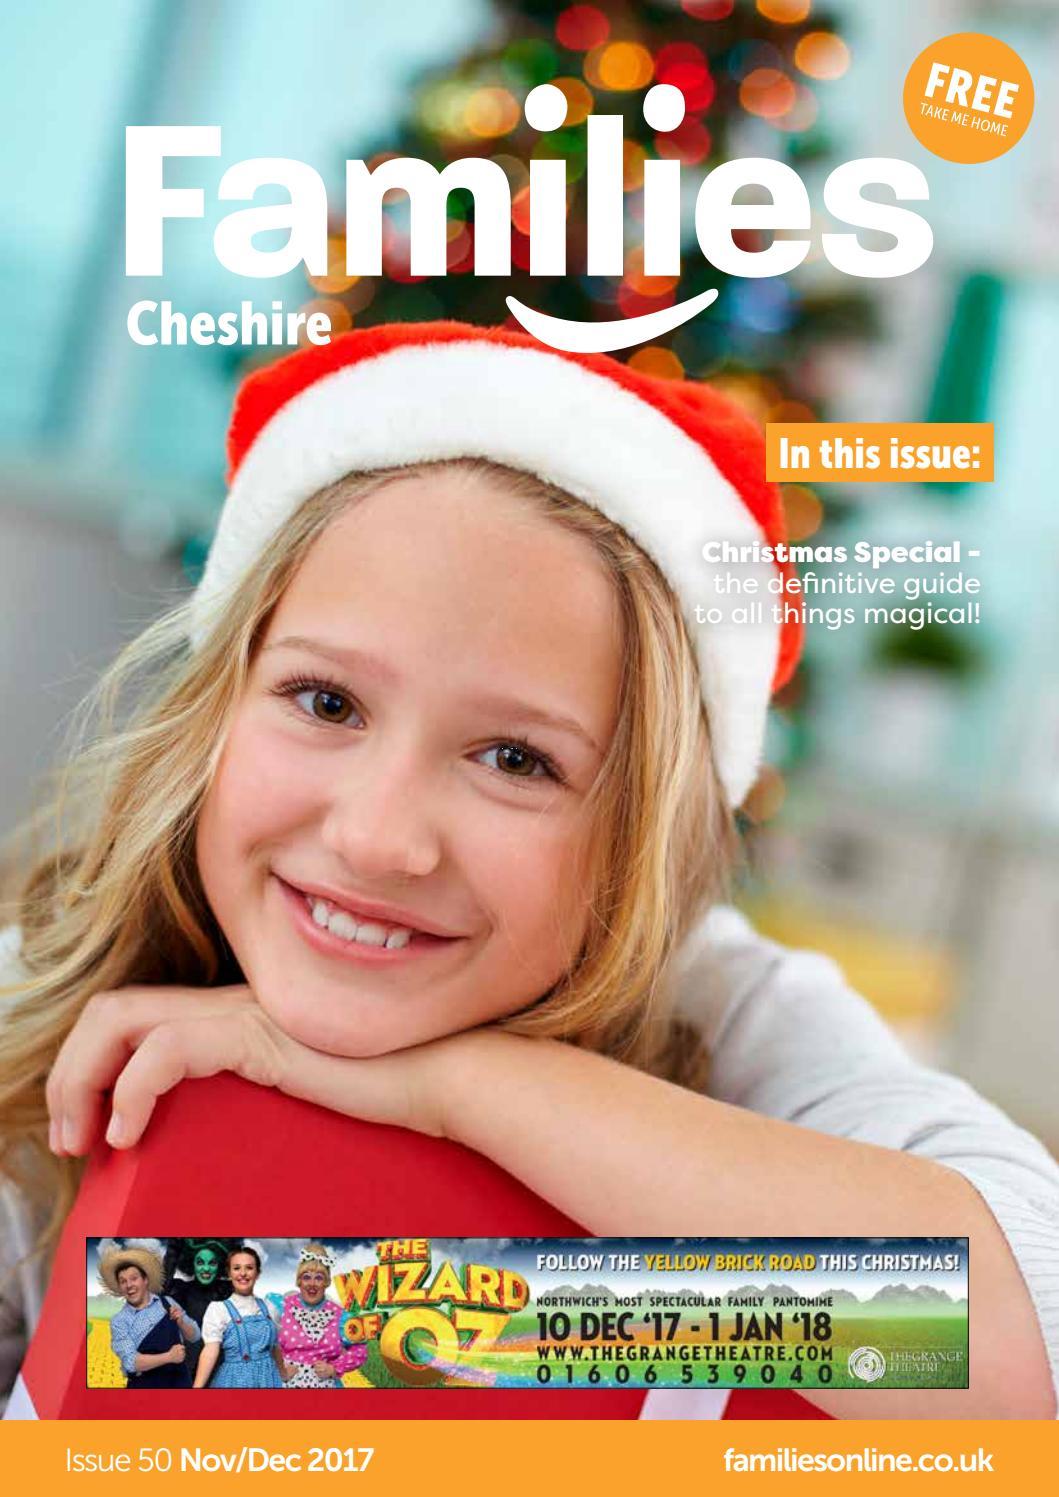 Christmas Childs Elf hat felt fancy dress Pantomine Christmas Novelty